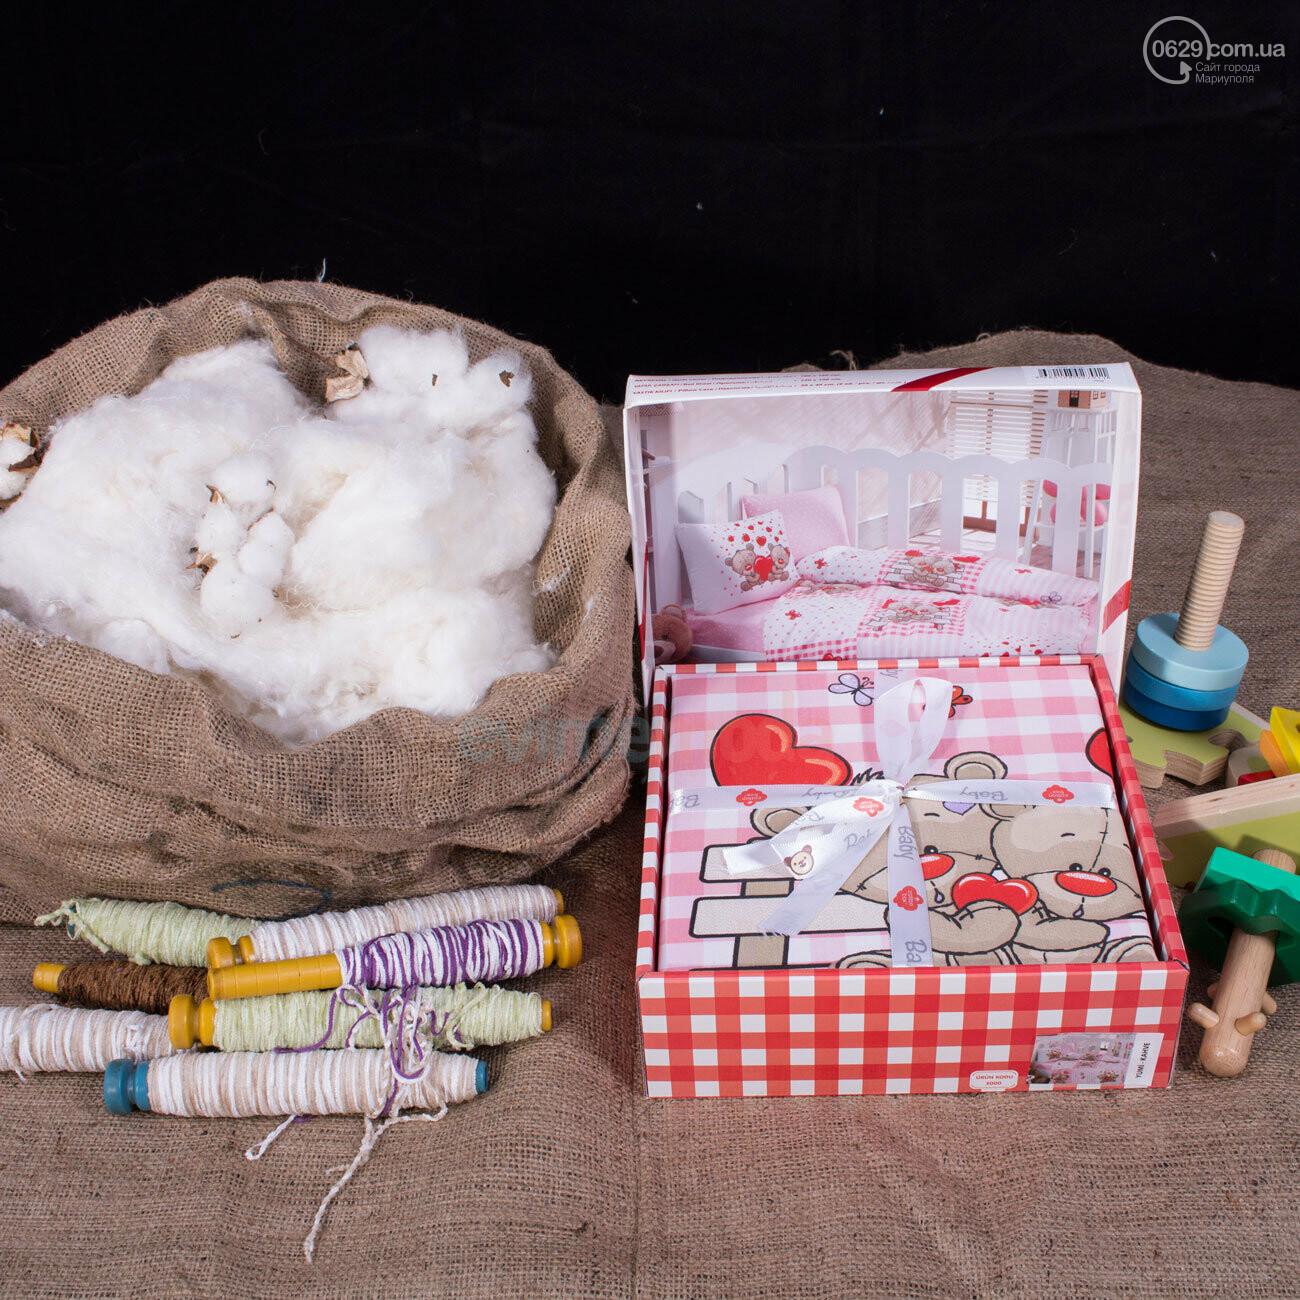 Клуб домашнего текстиля - встречайте зиму вместе с нами!!!, фото-6